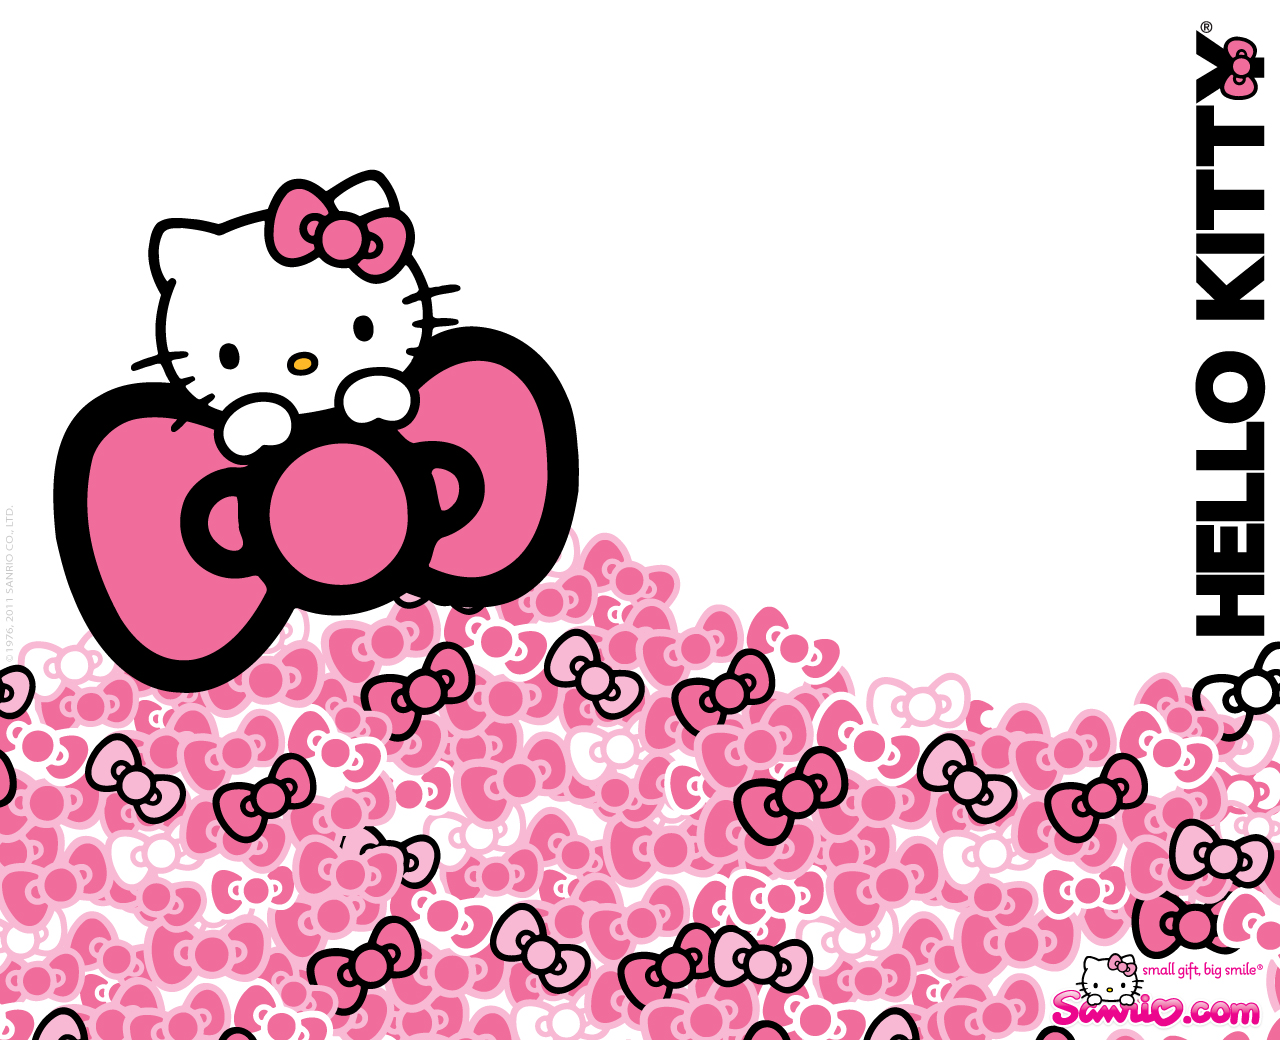 http://1.bp.blogspot.com/-m8TAo72PUHg/UQCcV5RkqnI/AAAAAAAABTk/HQeSAT6PxF8/s1600/Hello-kitty-Wallpapers-From-Sanrio-Website.jpg